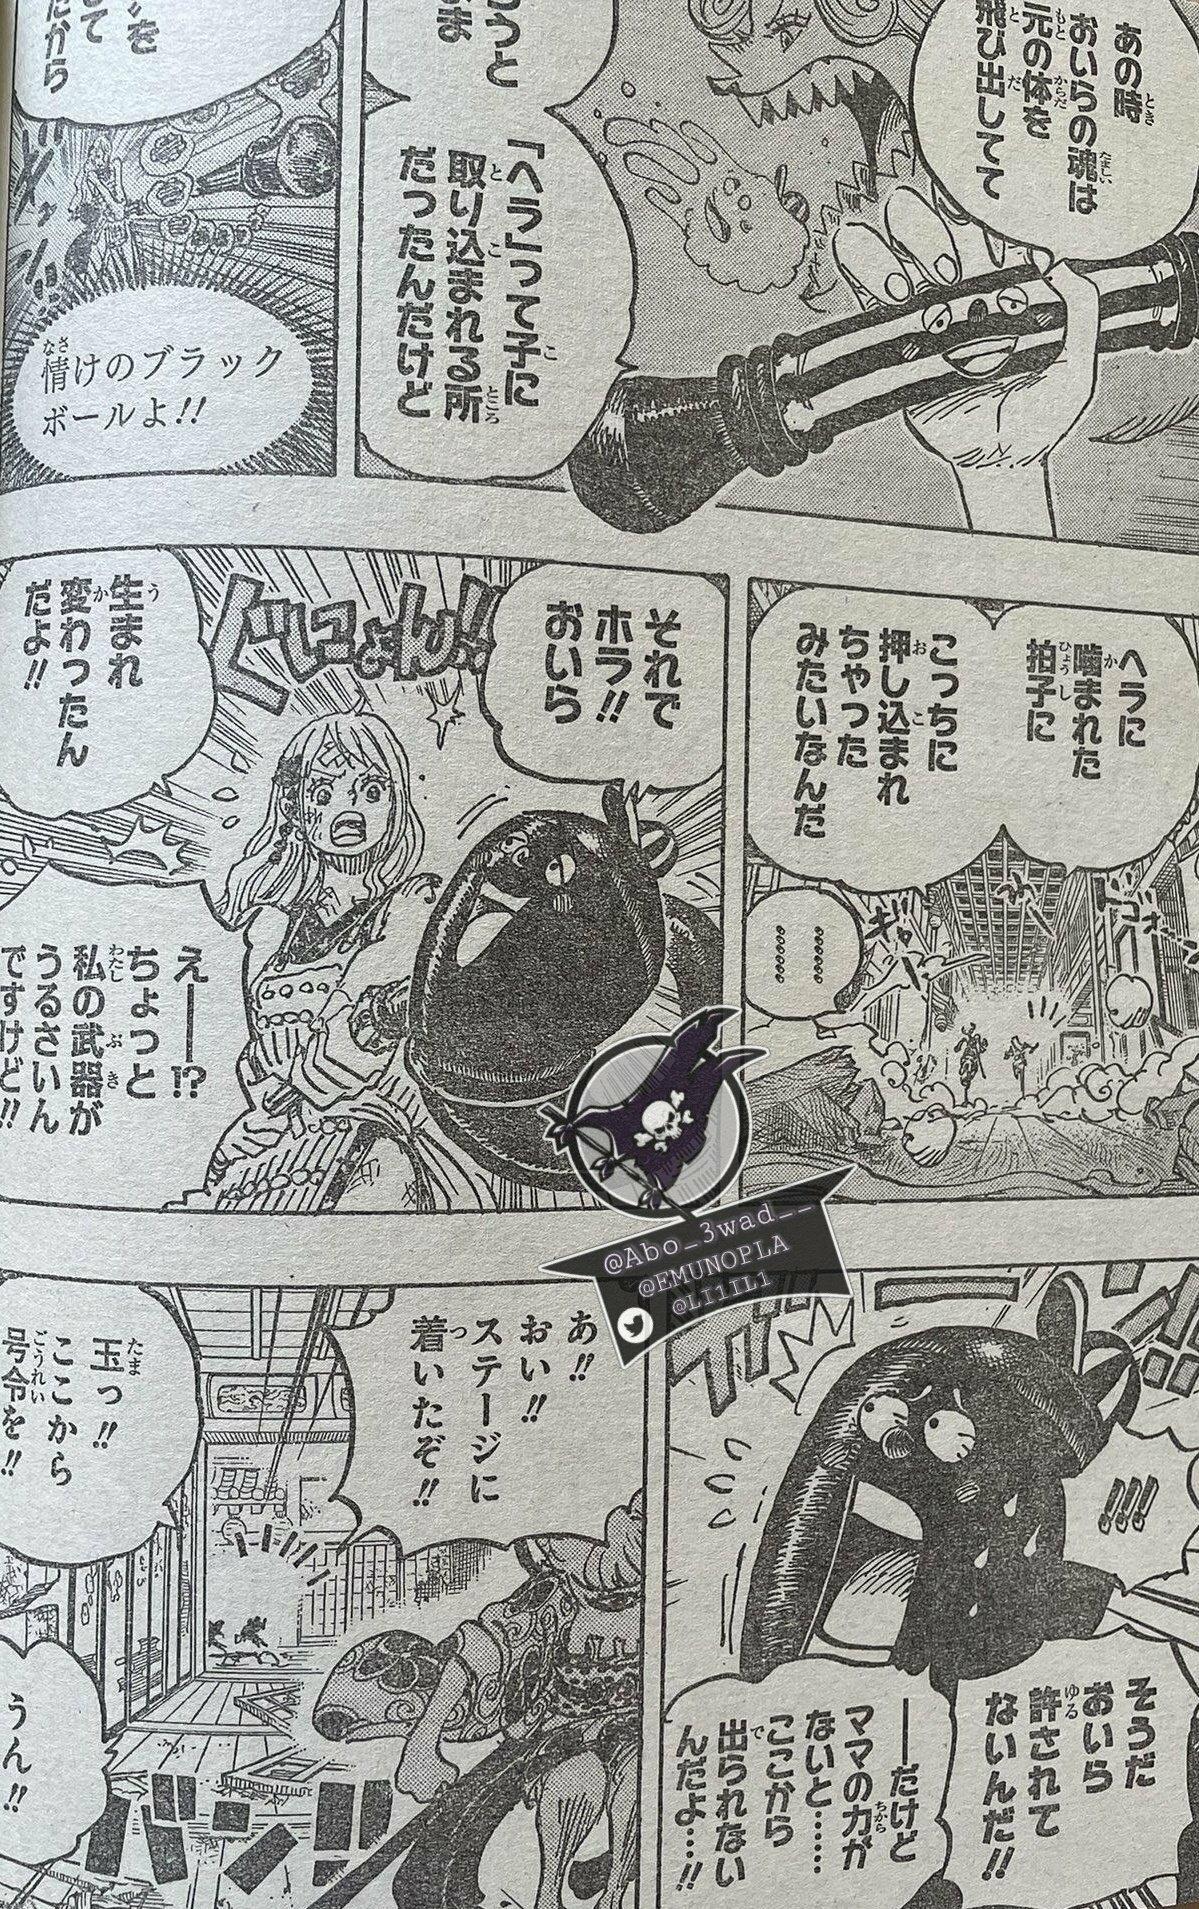 One Piece chapitre 1016 - Page 5 - Nouvelles Sorties - Forums Mangas France